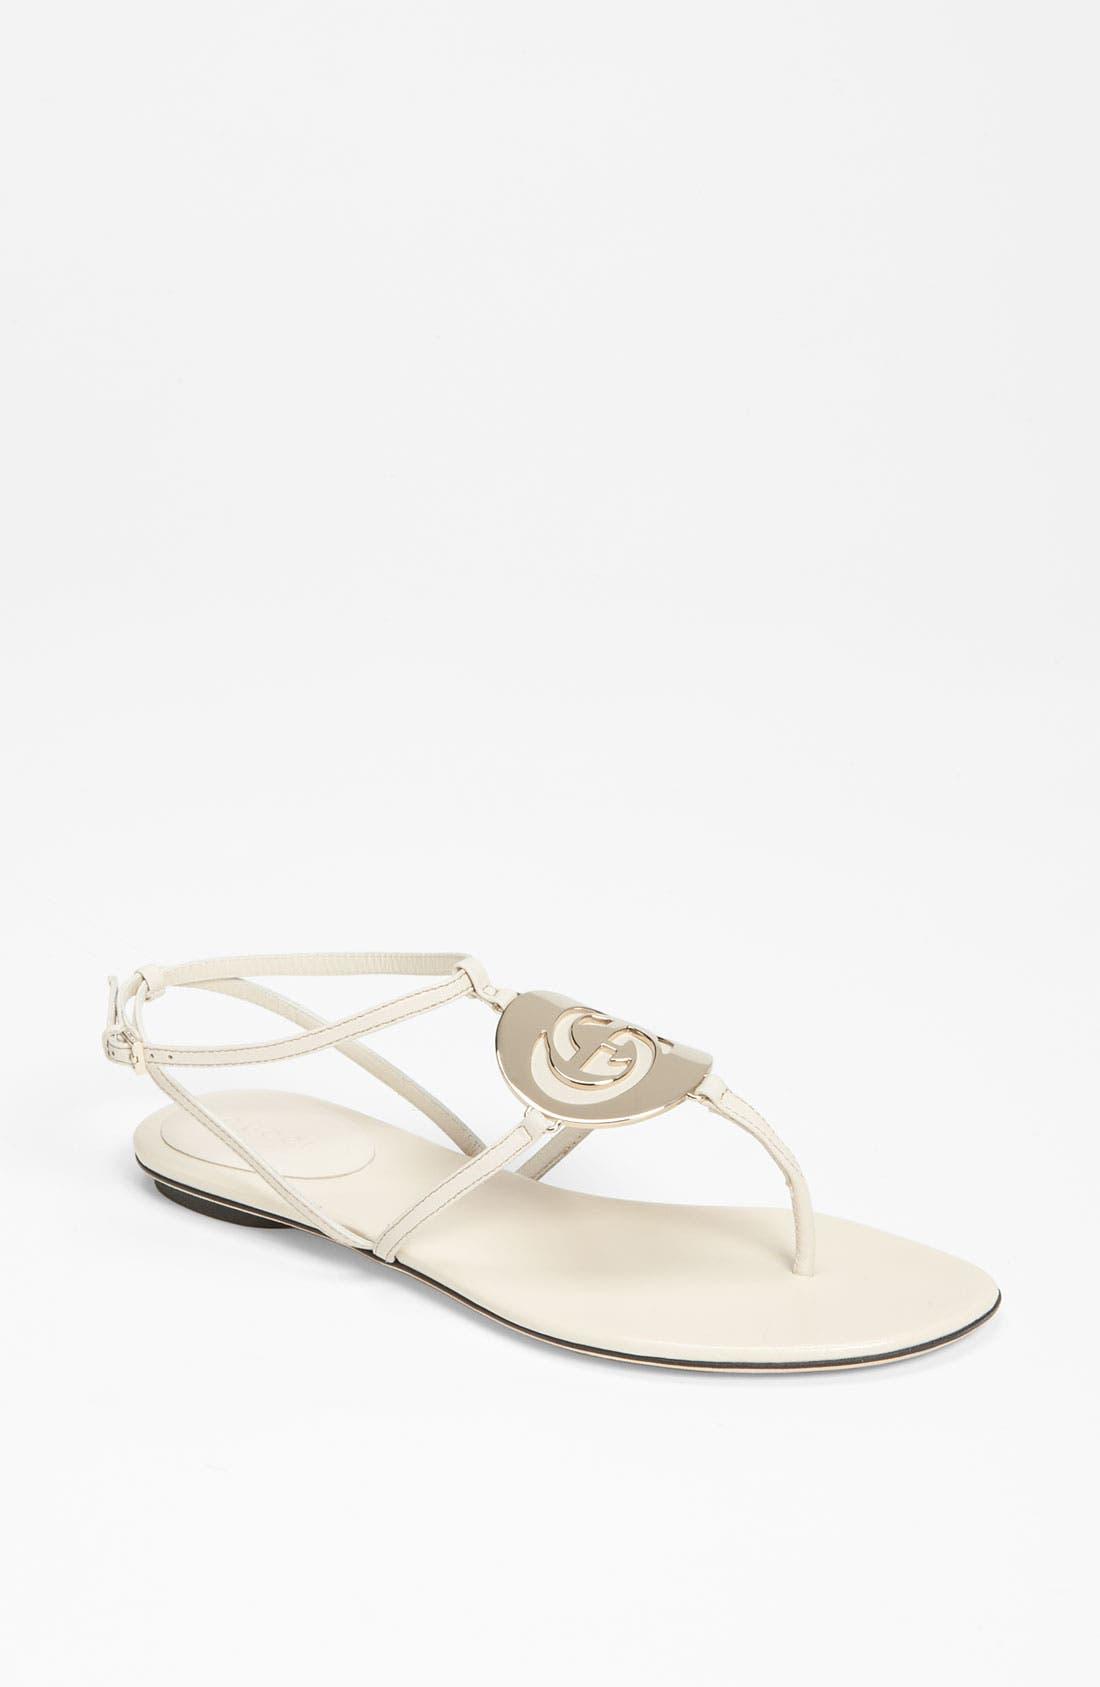 Main Image - Gucci 'GG' Sandal